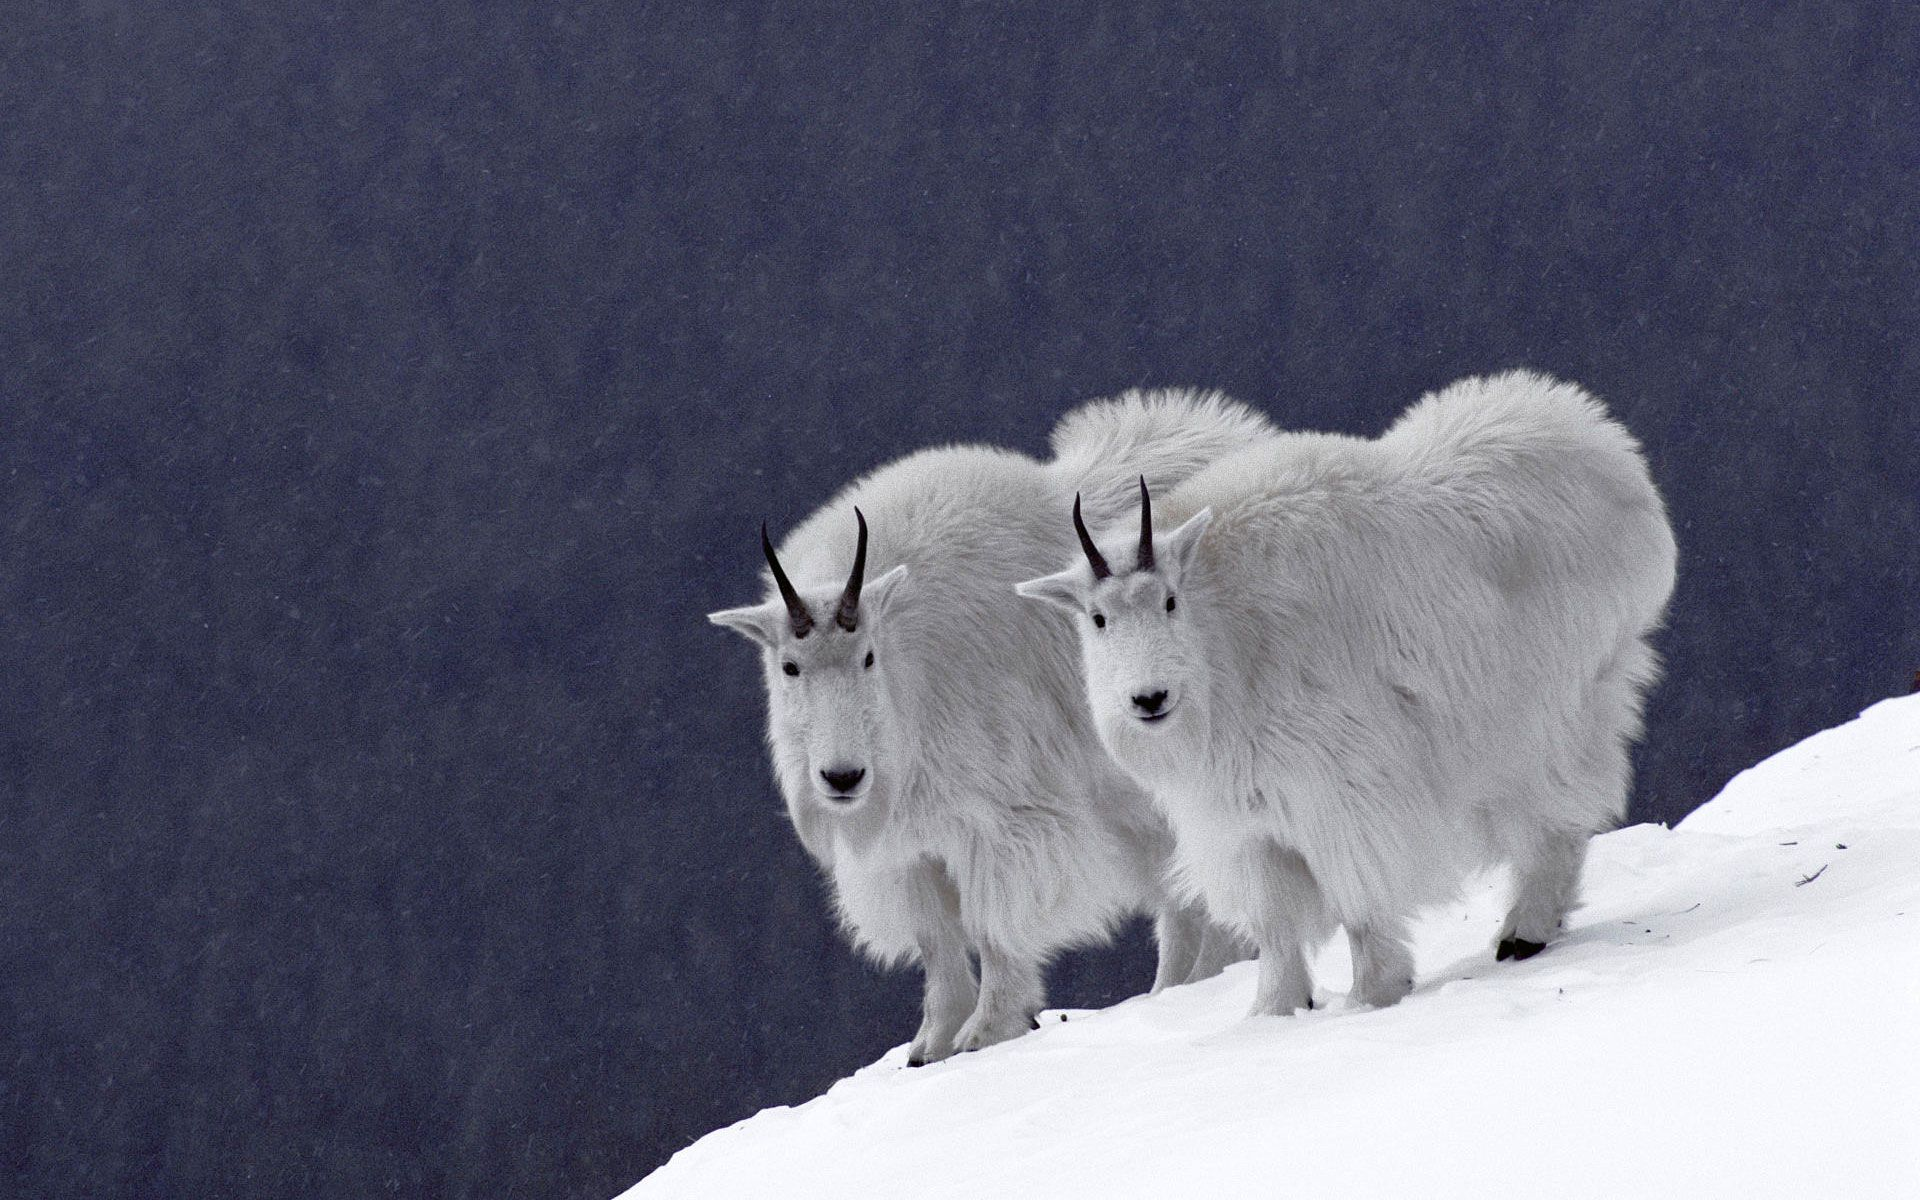 rocky mountains images mountain goats rocky mountains